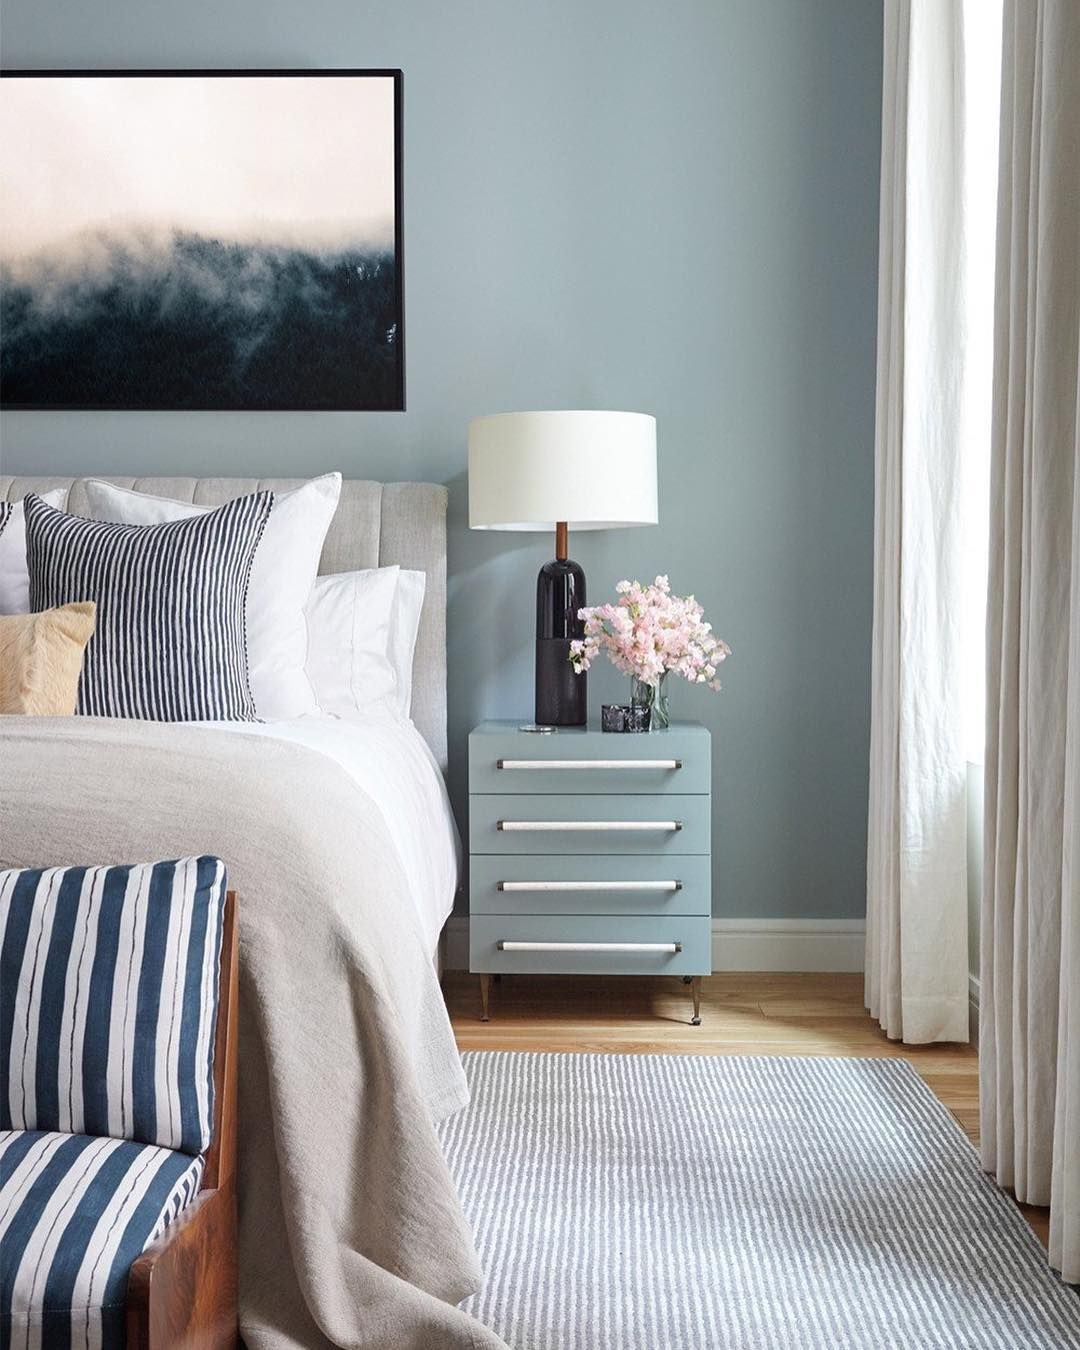 Spare Bedroom Colour Ideas Zoella Bedroom Decor White Bedroom Paint Colors Bedroom Color Ideas Purple: Ã�ッドルーム, Ã�ッドルームの